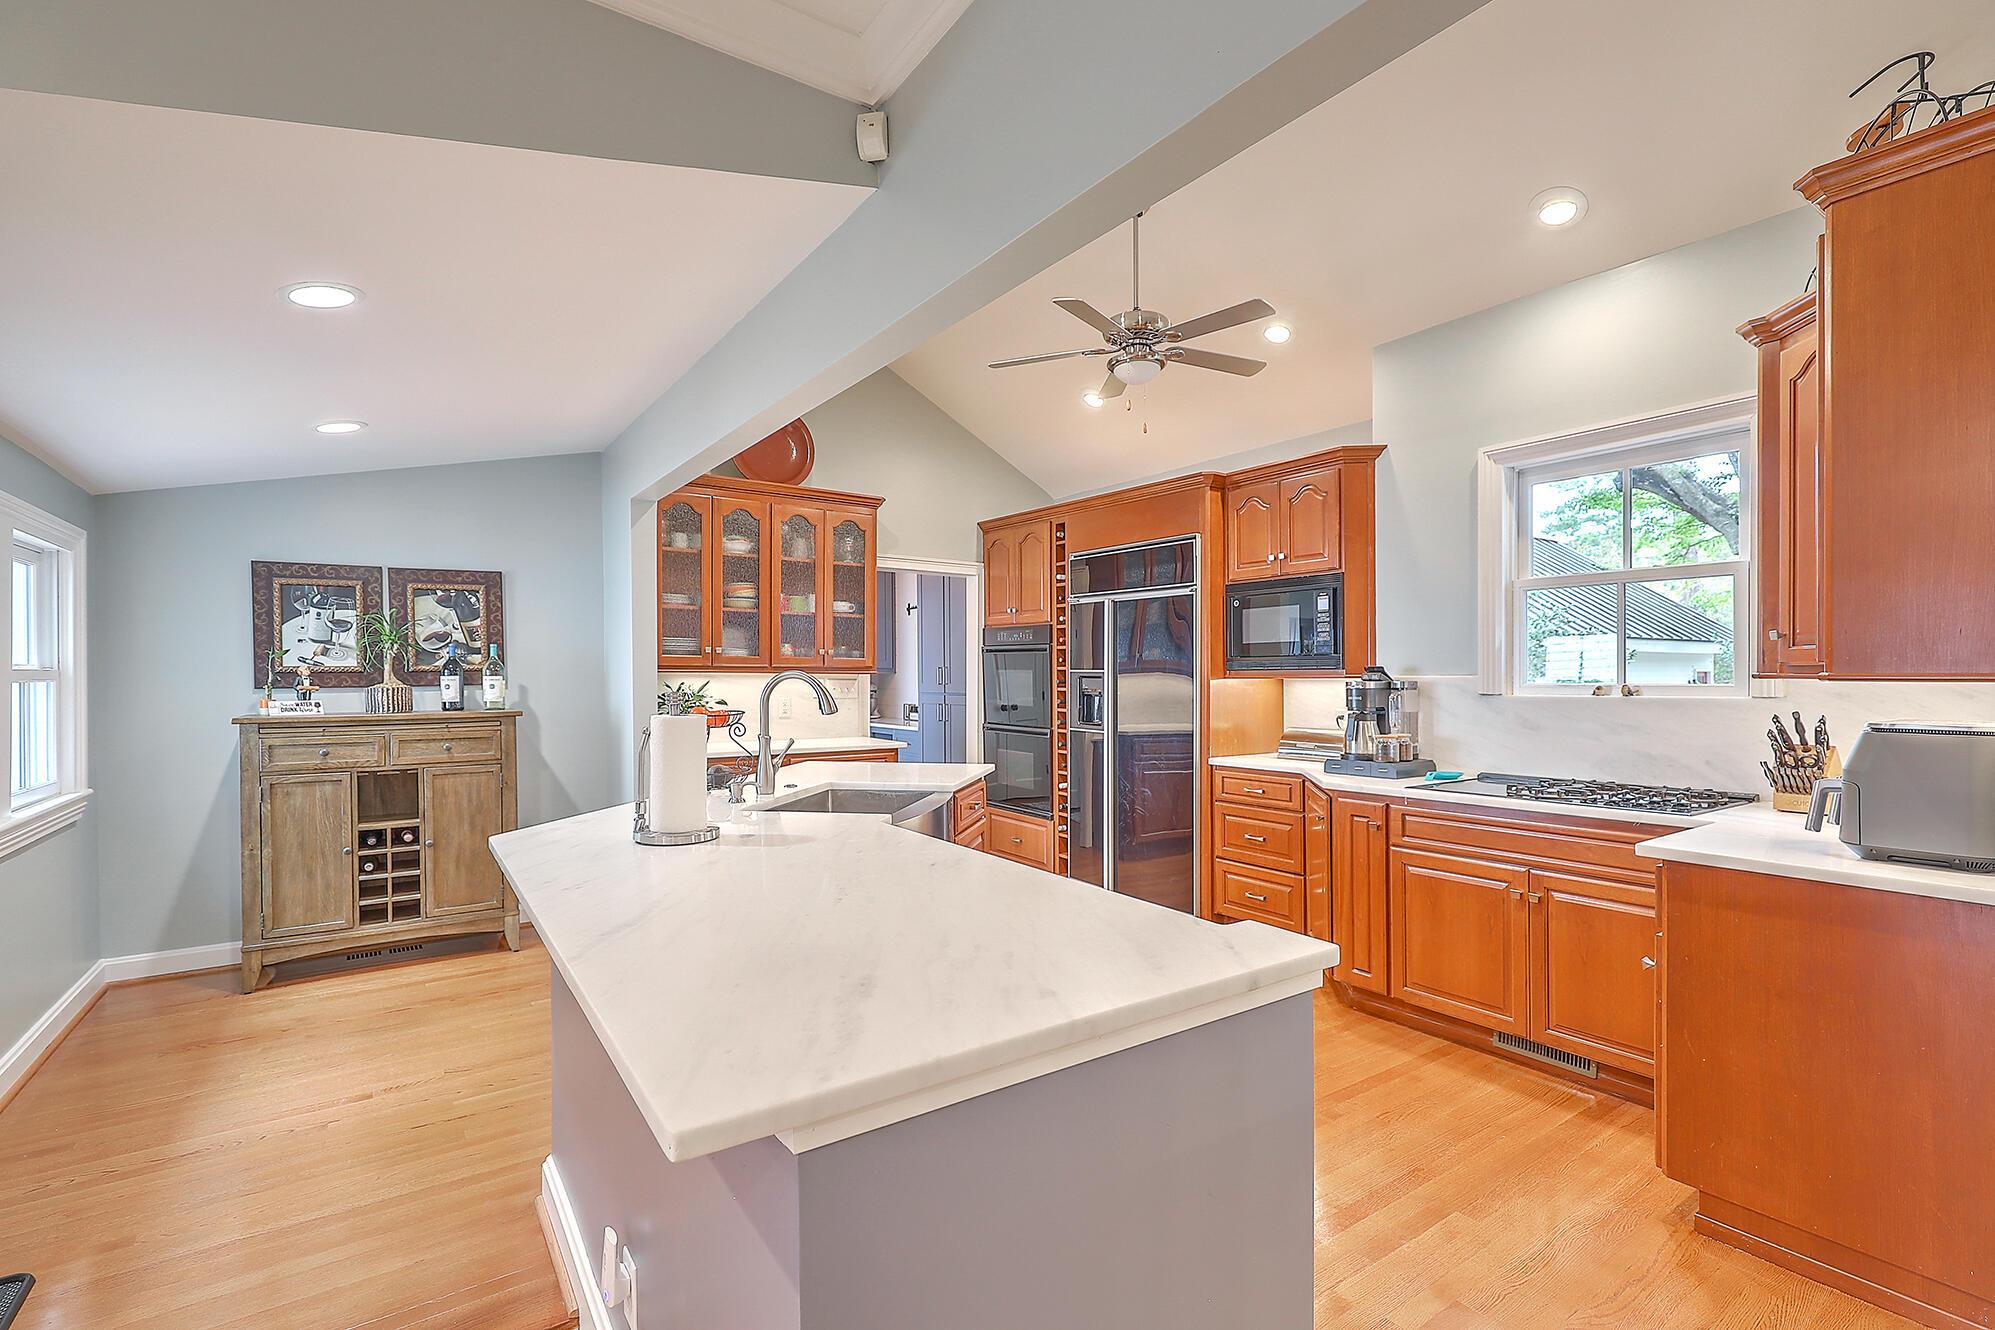 Summerville Homes For Sale - 102 Hickory, Summerville, SC - 48